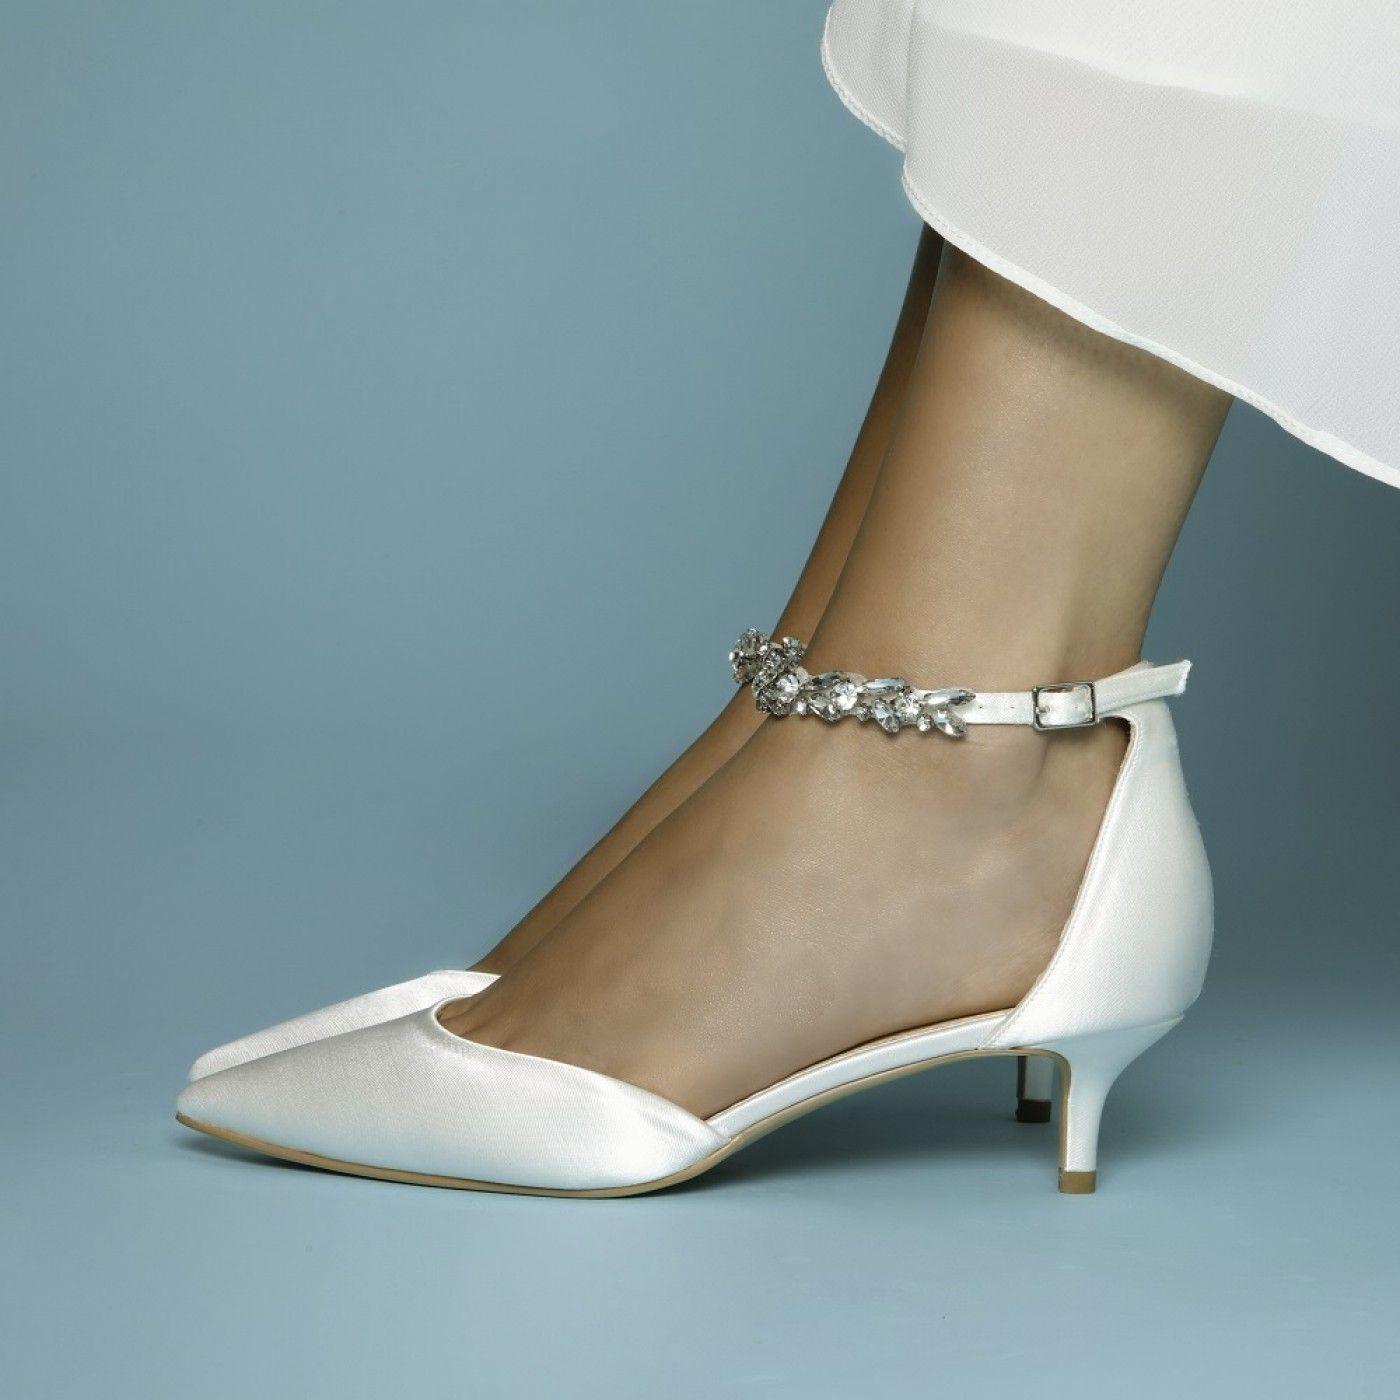 Perfect Bridal Eliza Ivory Satin Embellished Ankle Strap Kitten Heels In 2020 Bridal Shoes Low Heel Kitten Heel Wedding Shoes Kitten Heels Wedding